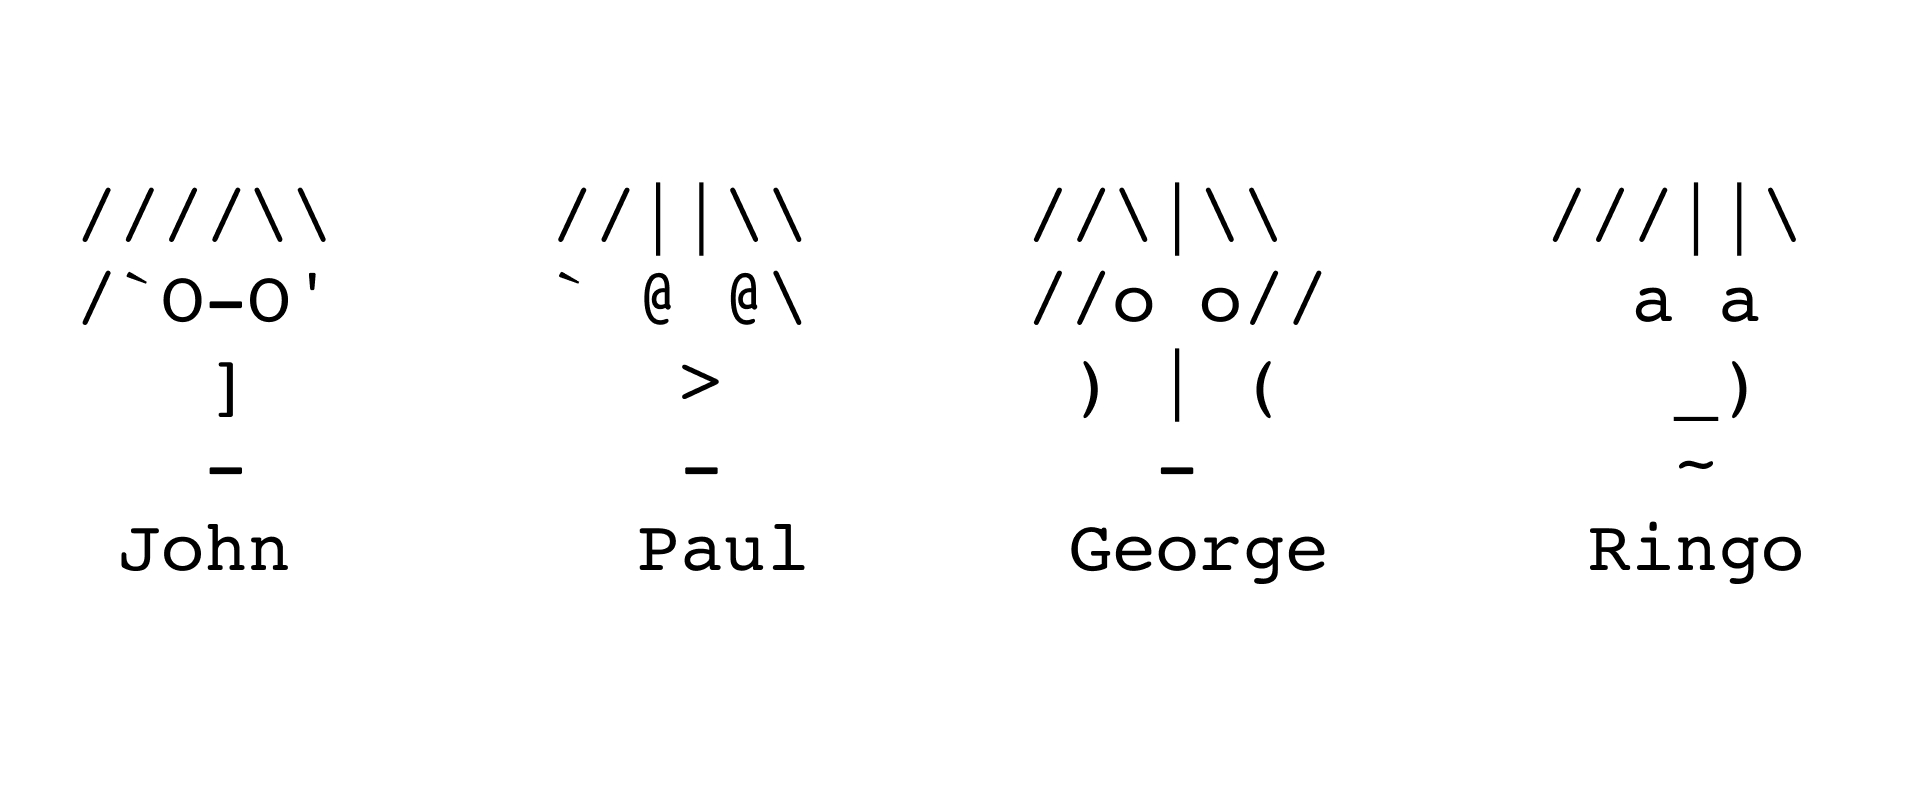 ASCII art of The Beatles